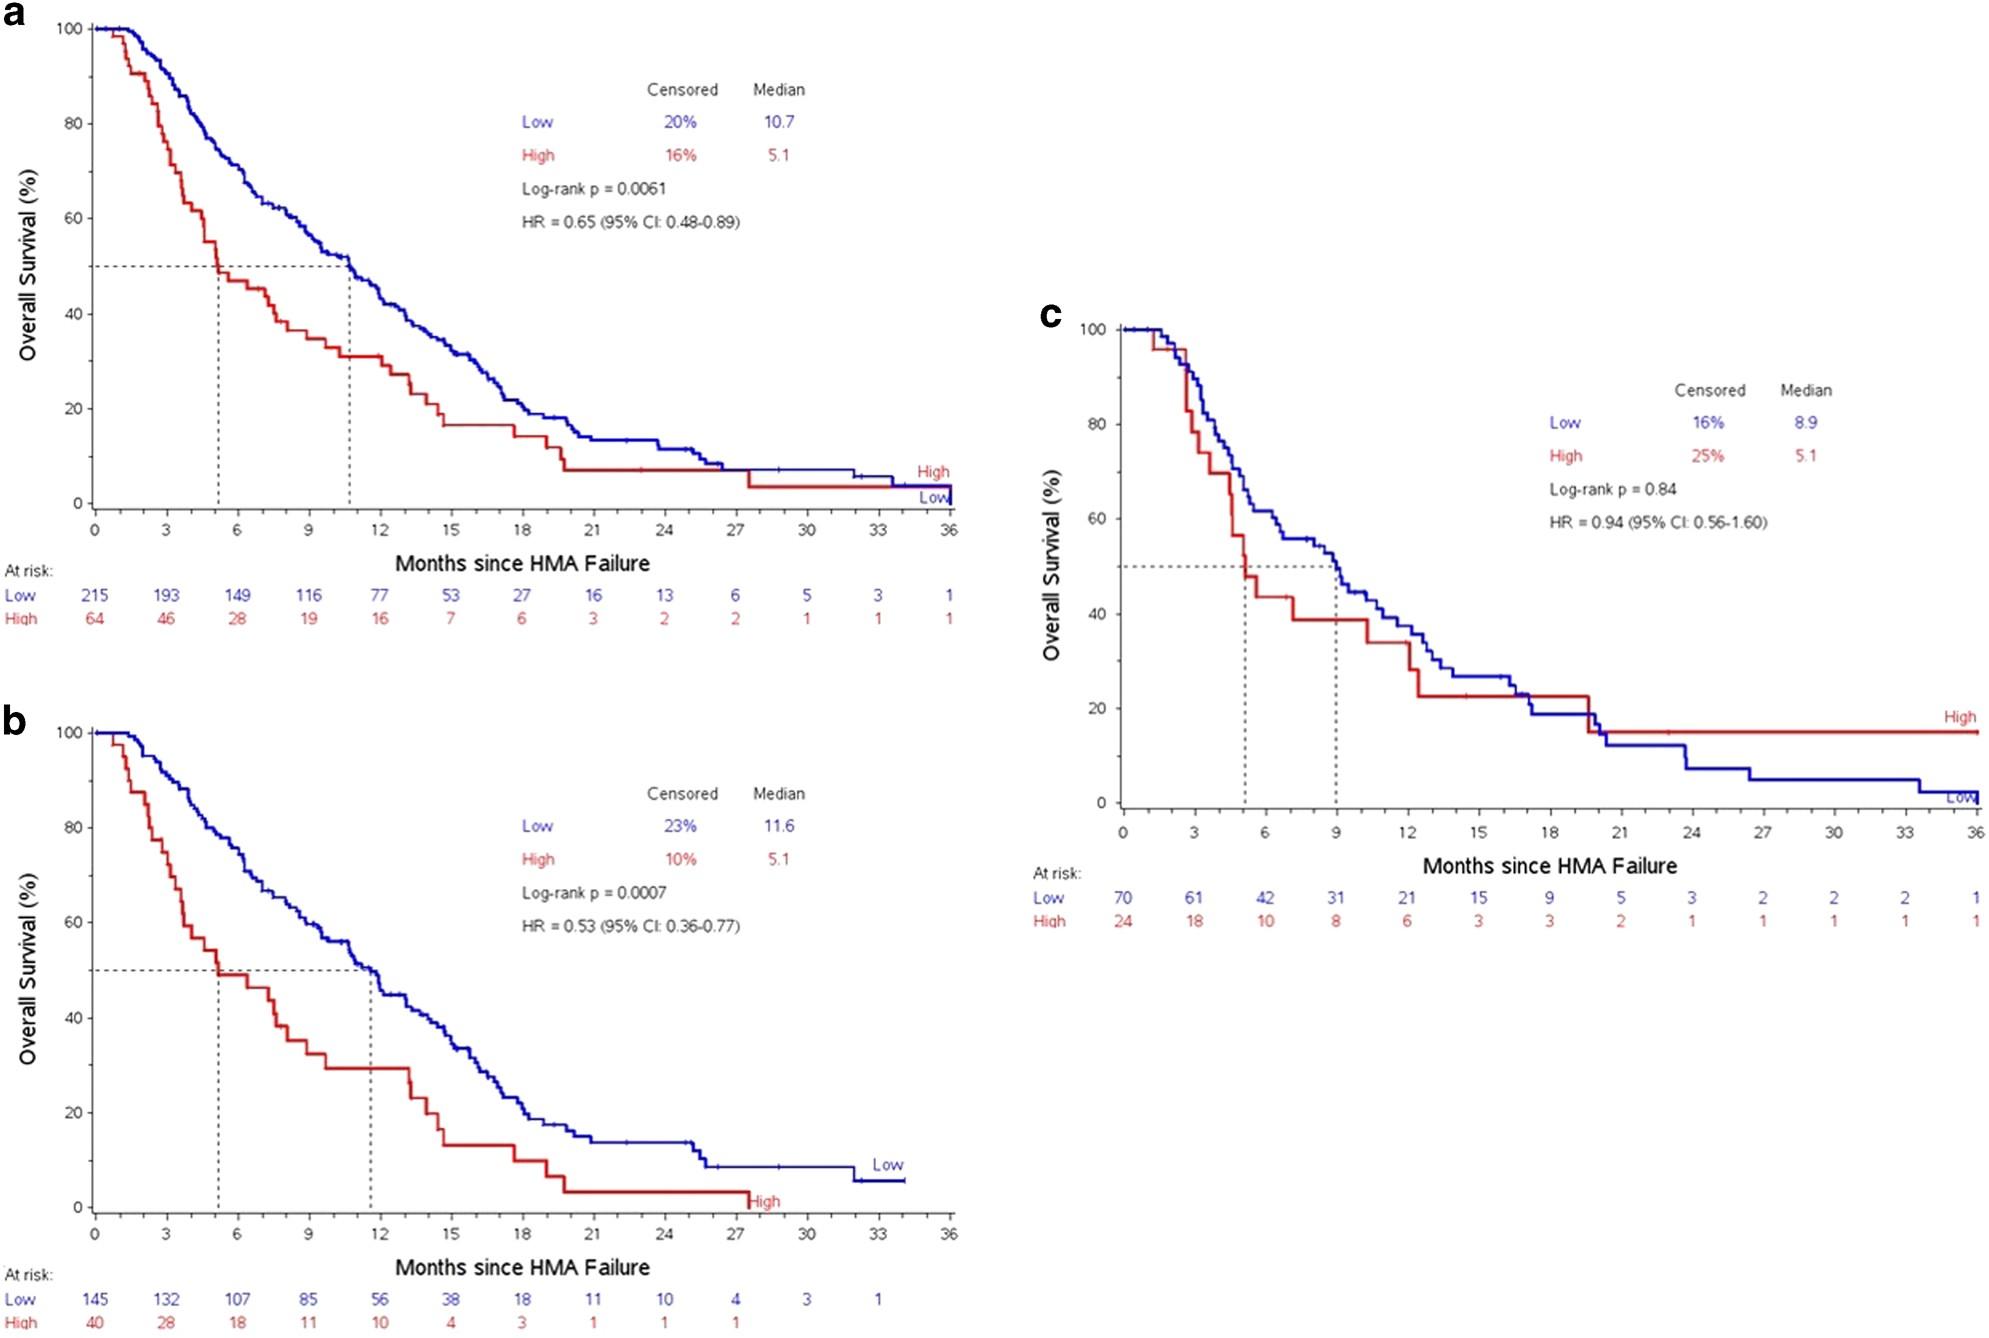 Validation of a post-hypomethylating agent failure